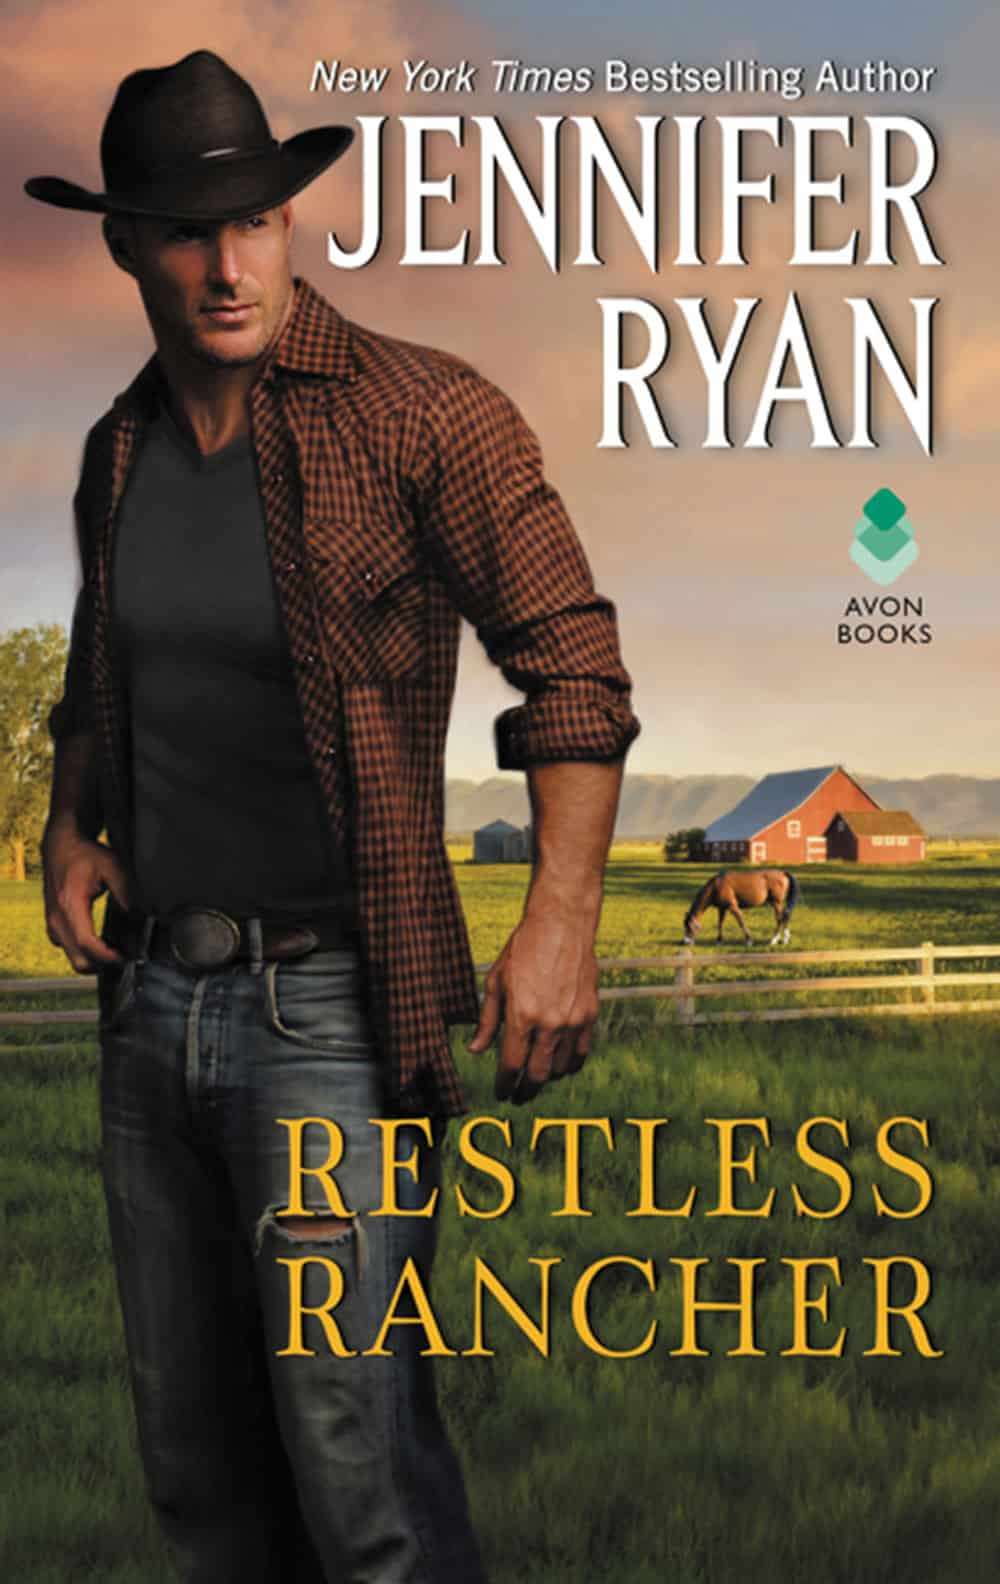 jennifer ryan restless rancher cowboy author cowgirl magazine